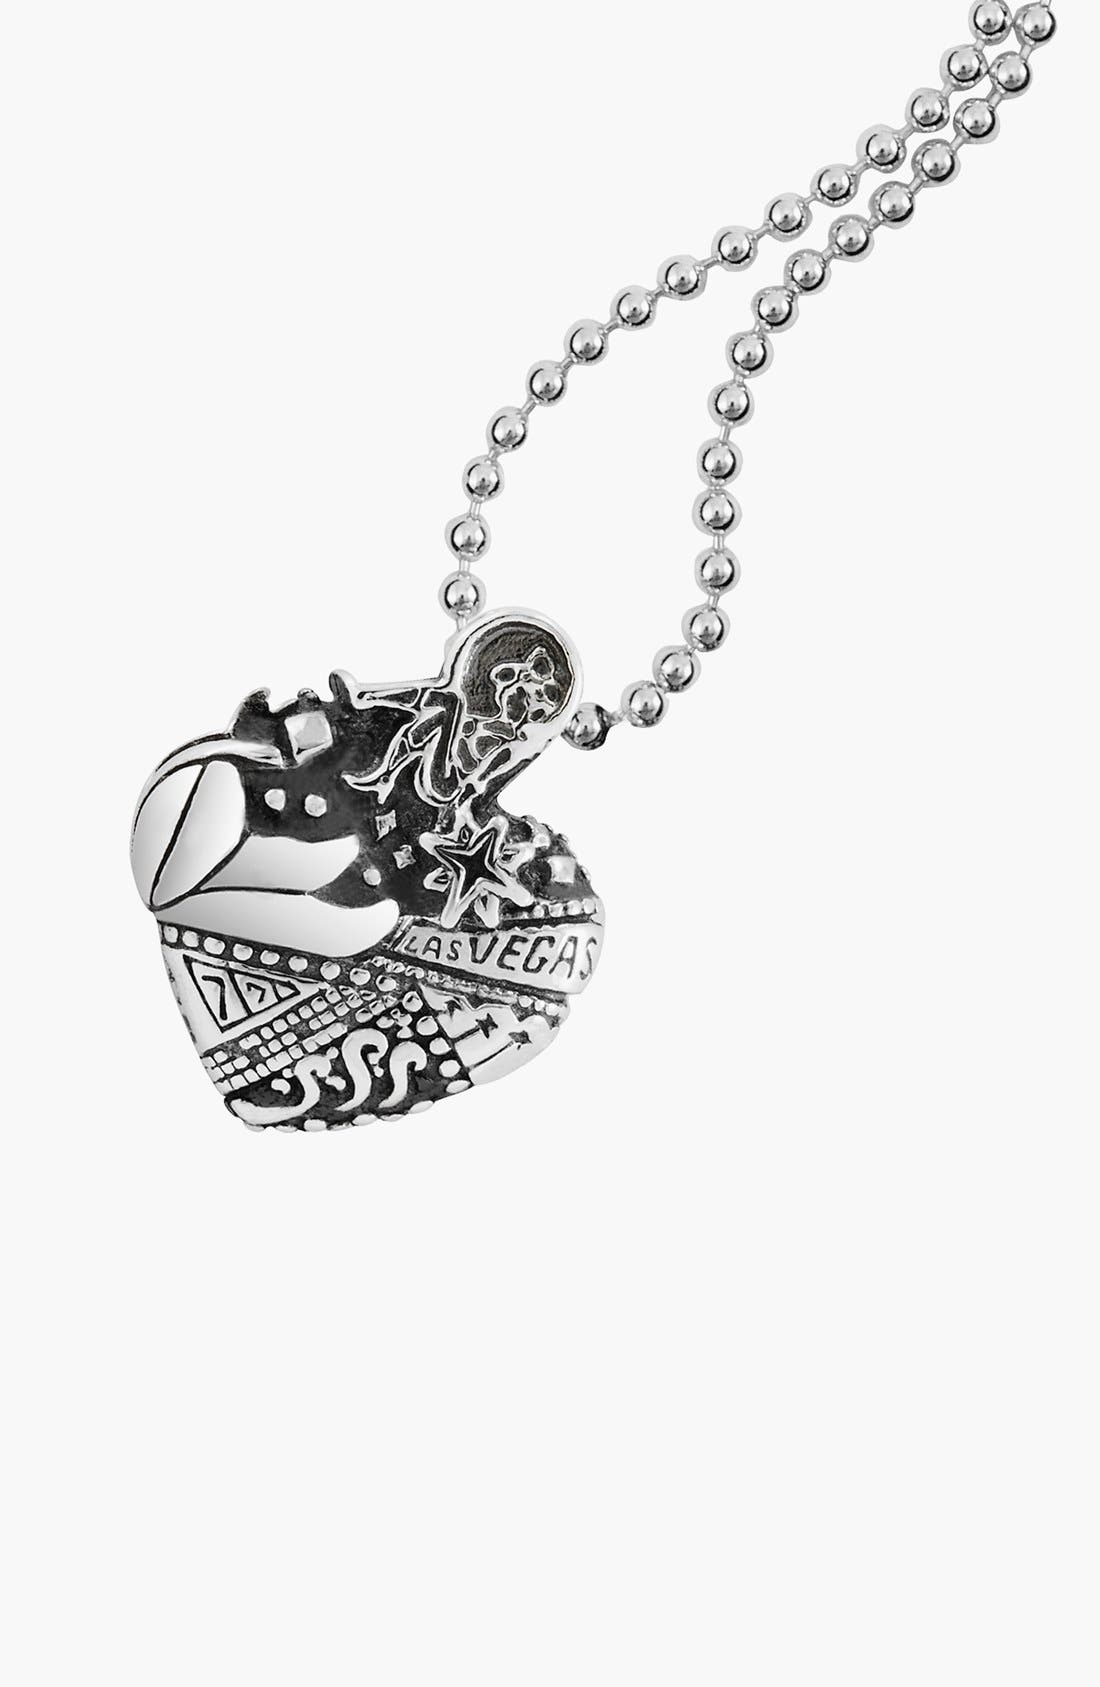 'Hearts of LAGOS - Las Vegas' Reversible Pendant Necklace,                             Alternate thumbnail 4, color,                             Heart Of Las Vegas